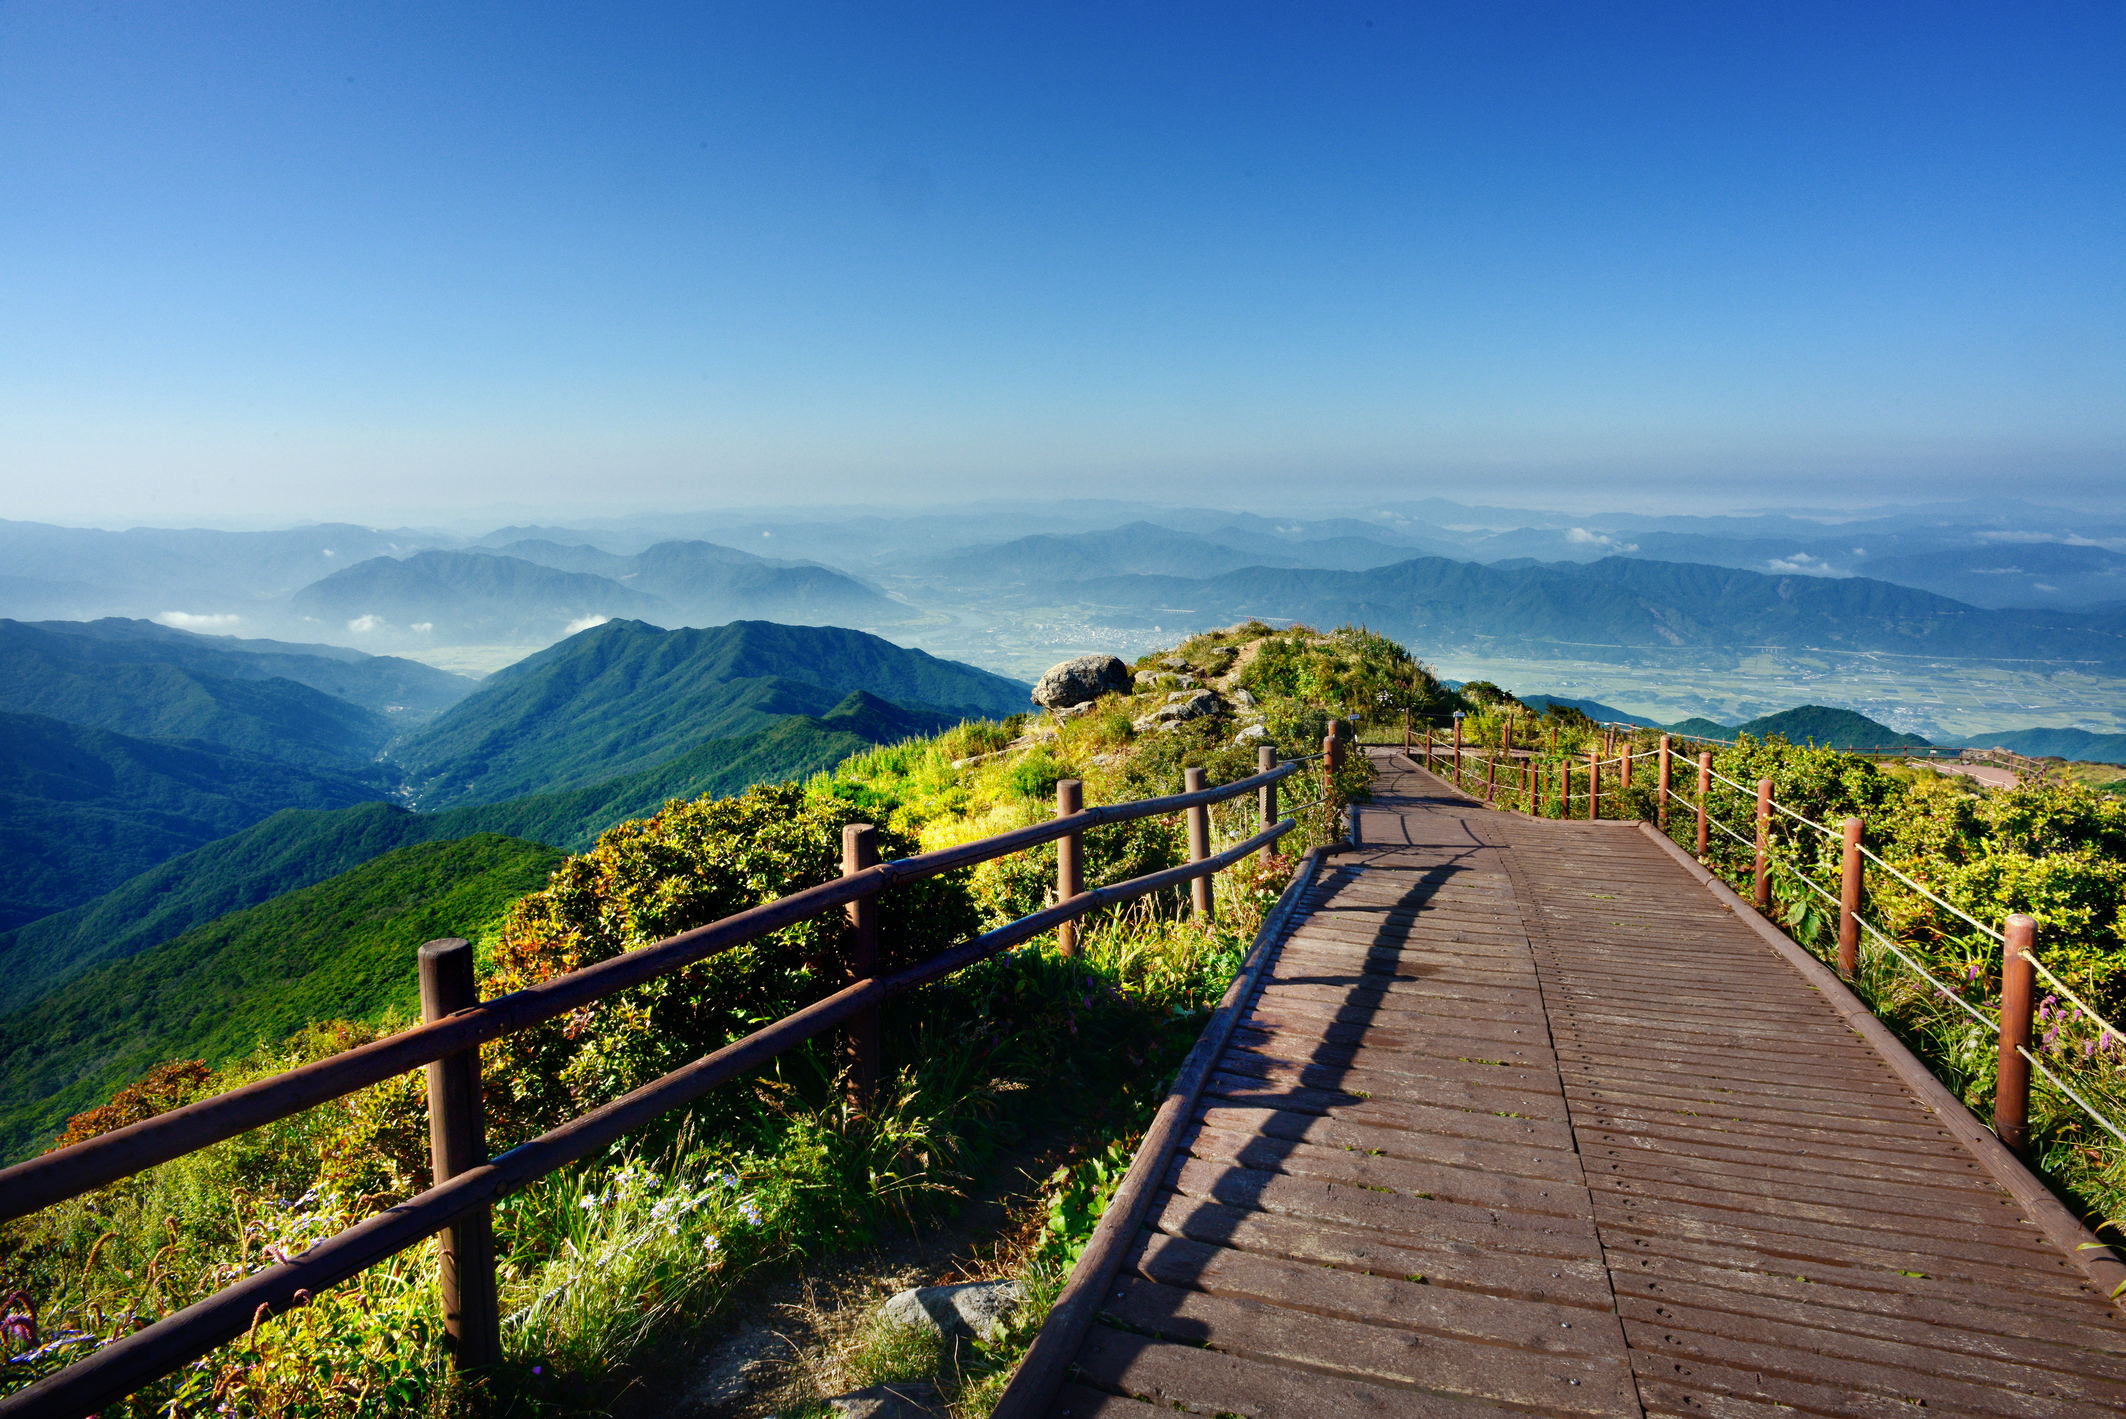 Mt. Jirisan Trekking & Beopjusa Temple Stay 이미지